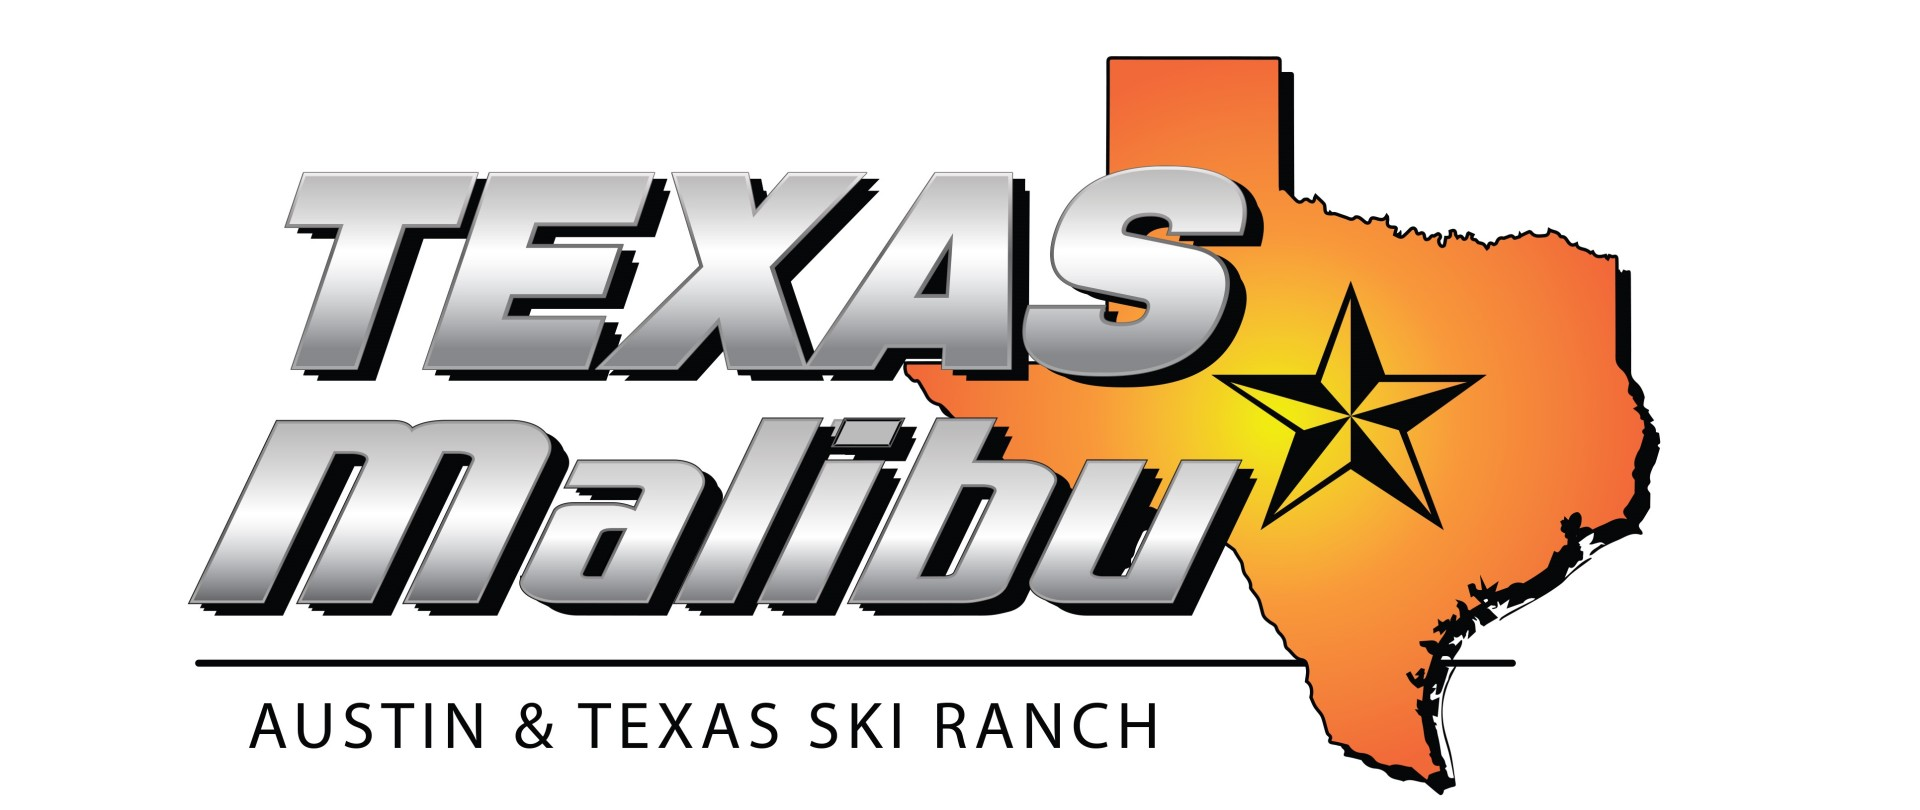 Texas-Malibu-Spin-Off--w1920.jpg